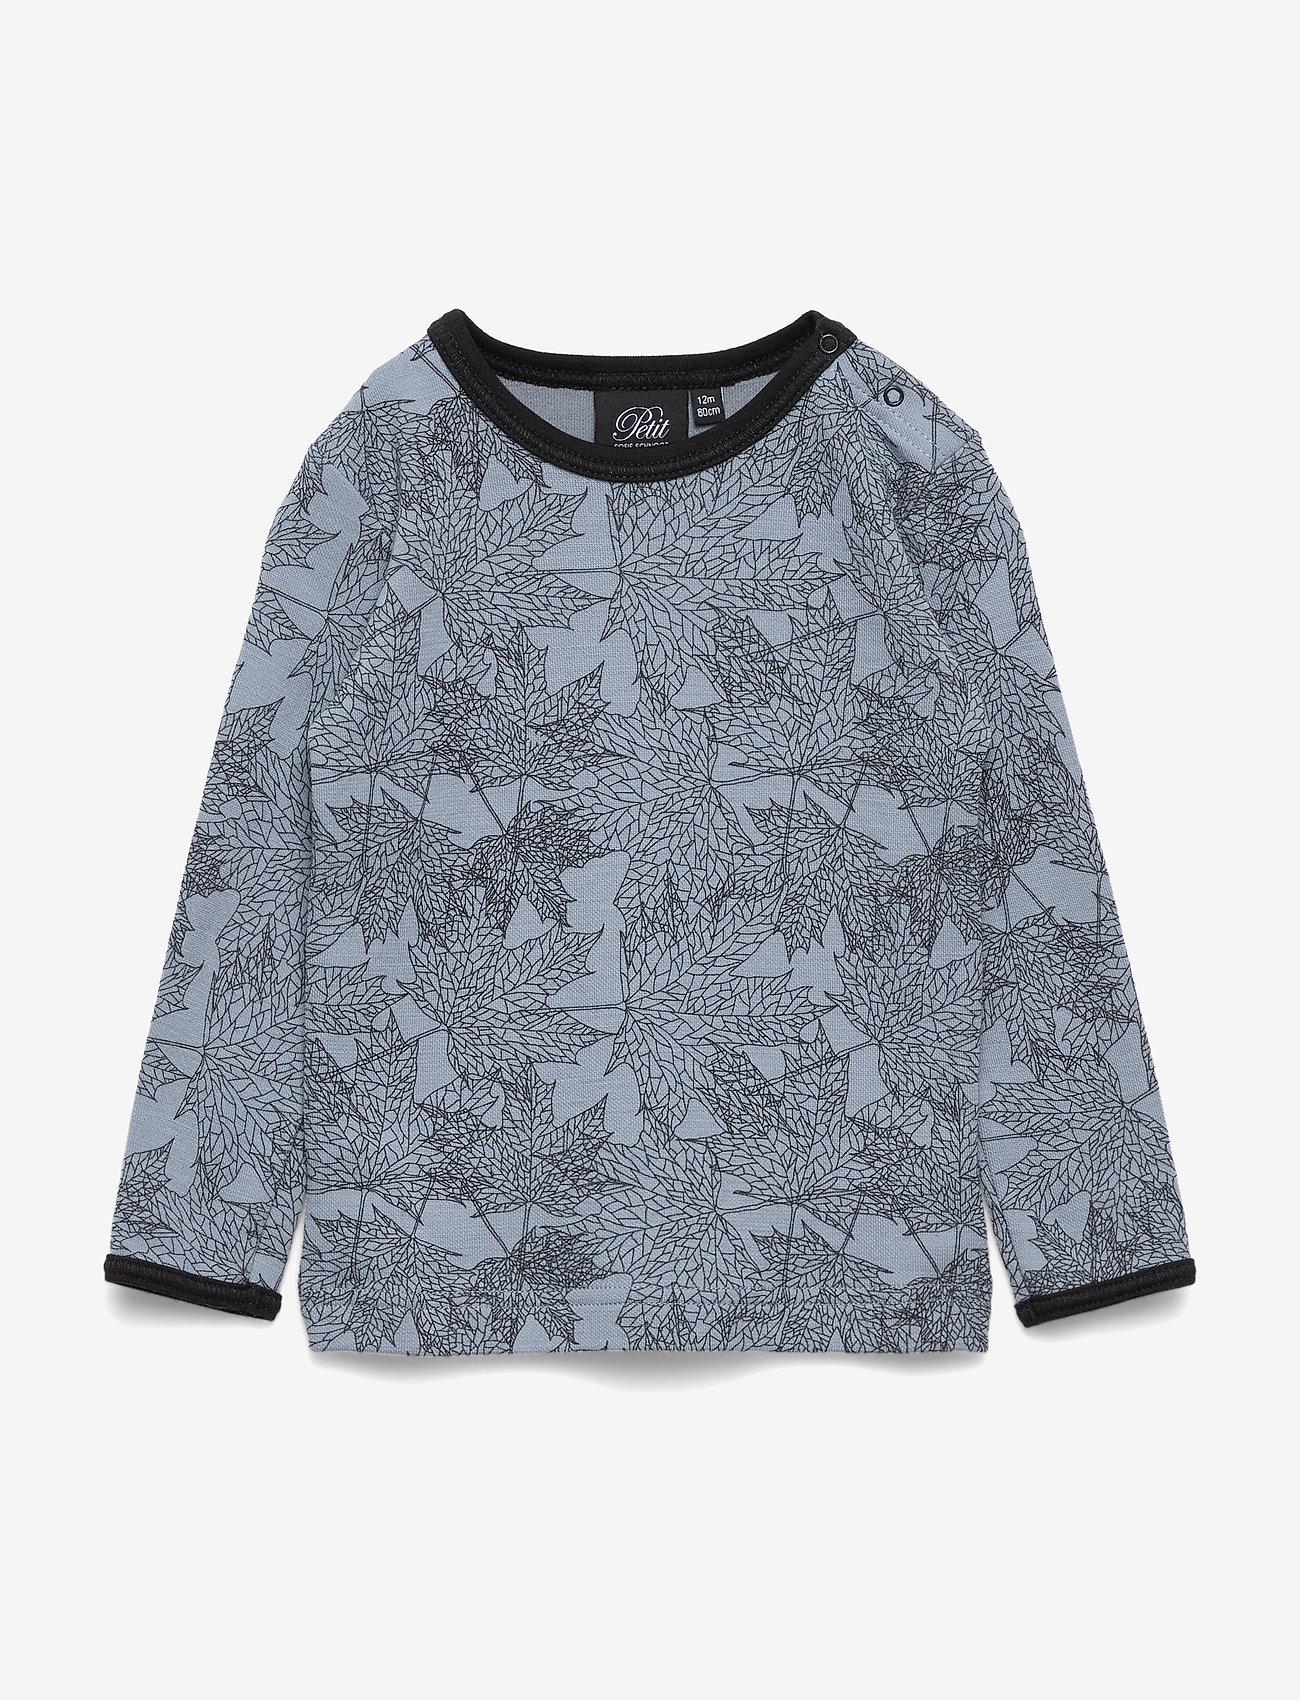 Petit by Sofie Schnoor - T-shirt - langærmede t-shirts - mist - 0